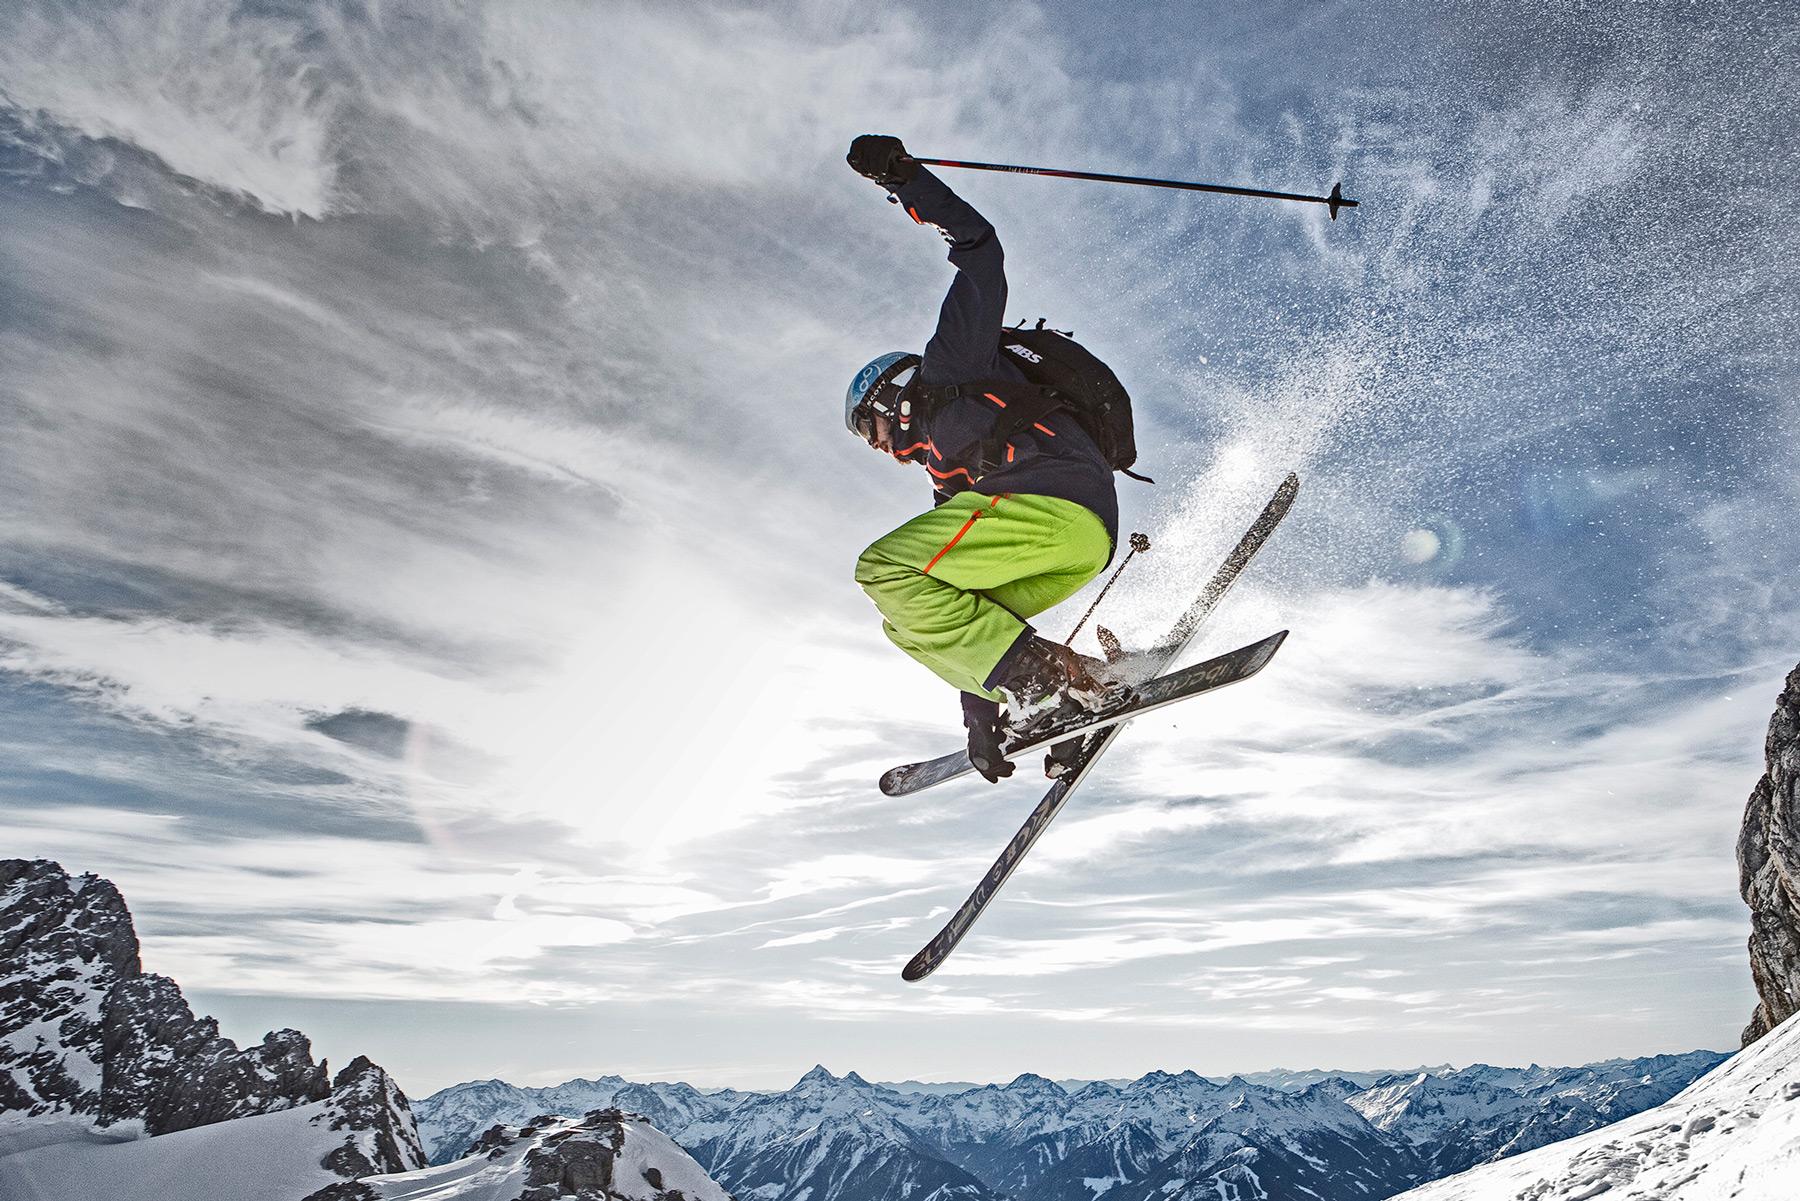 06-Pyua-Dachstein-Ski-Action-Christoph-Gramann